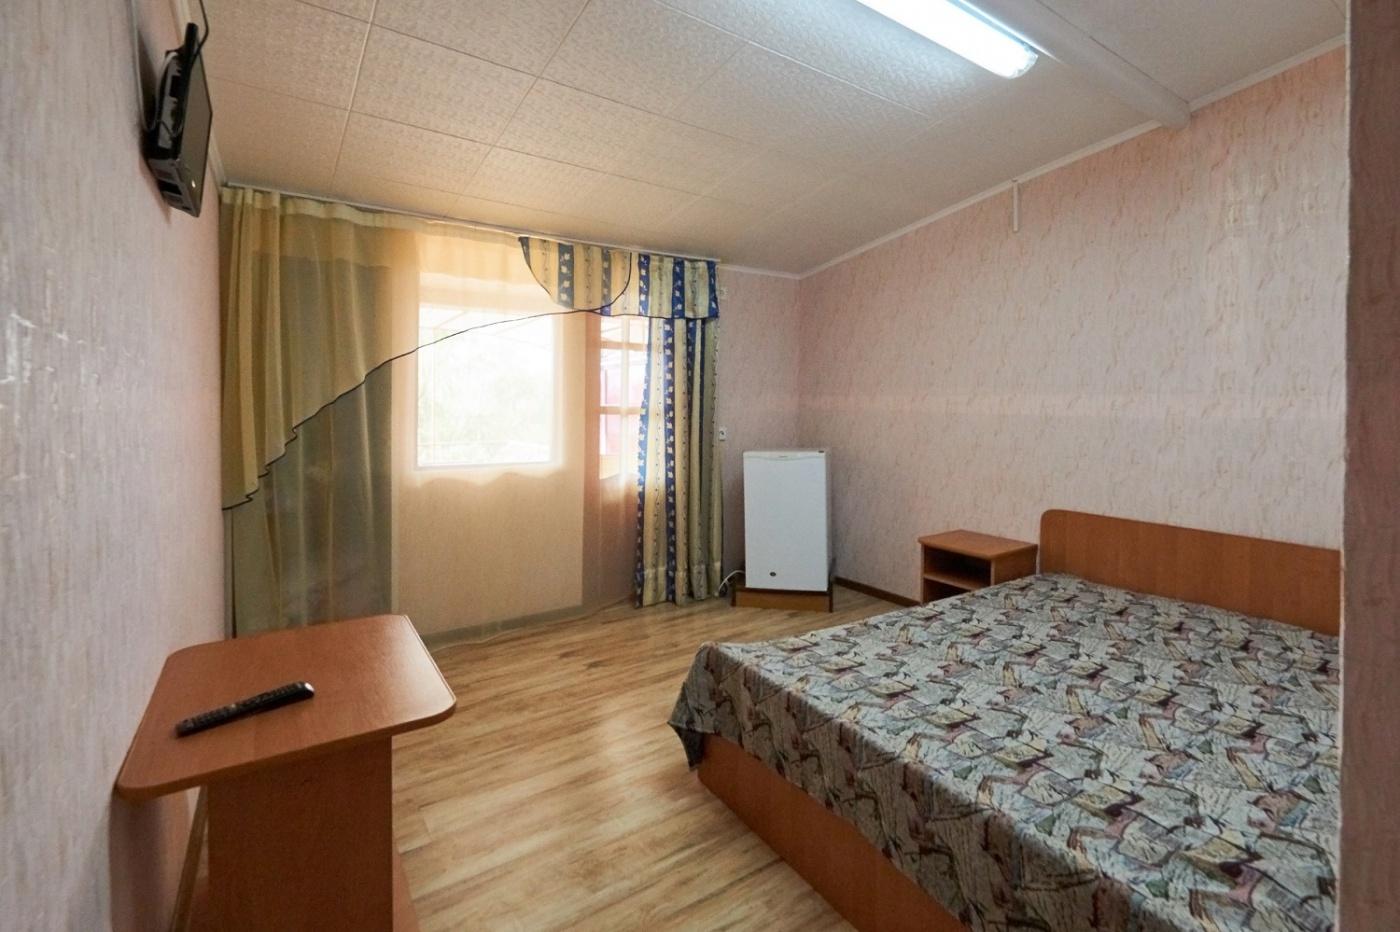 База отдыха «Ока» Краснодарский край Корпус А: 2-местный номер «Стандарт» с балконом, фото 1